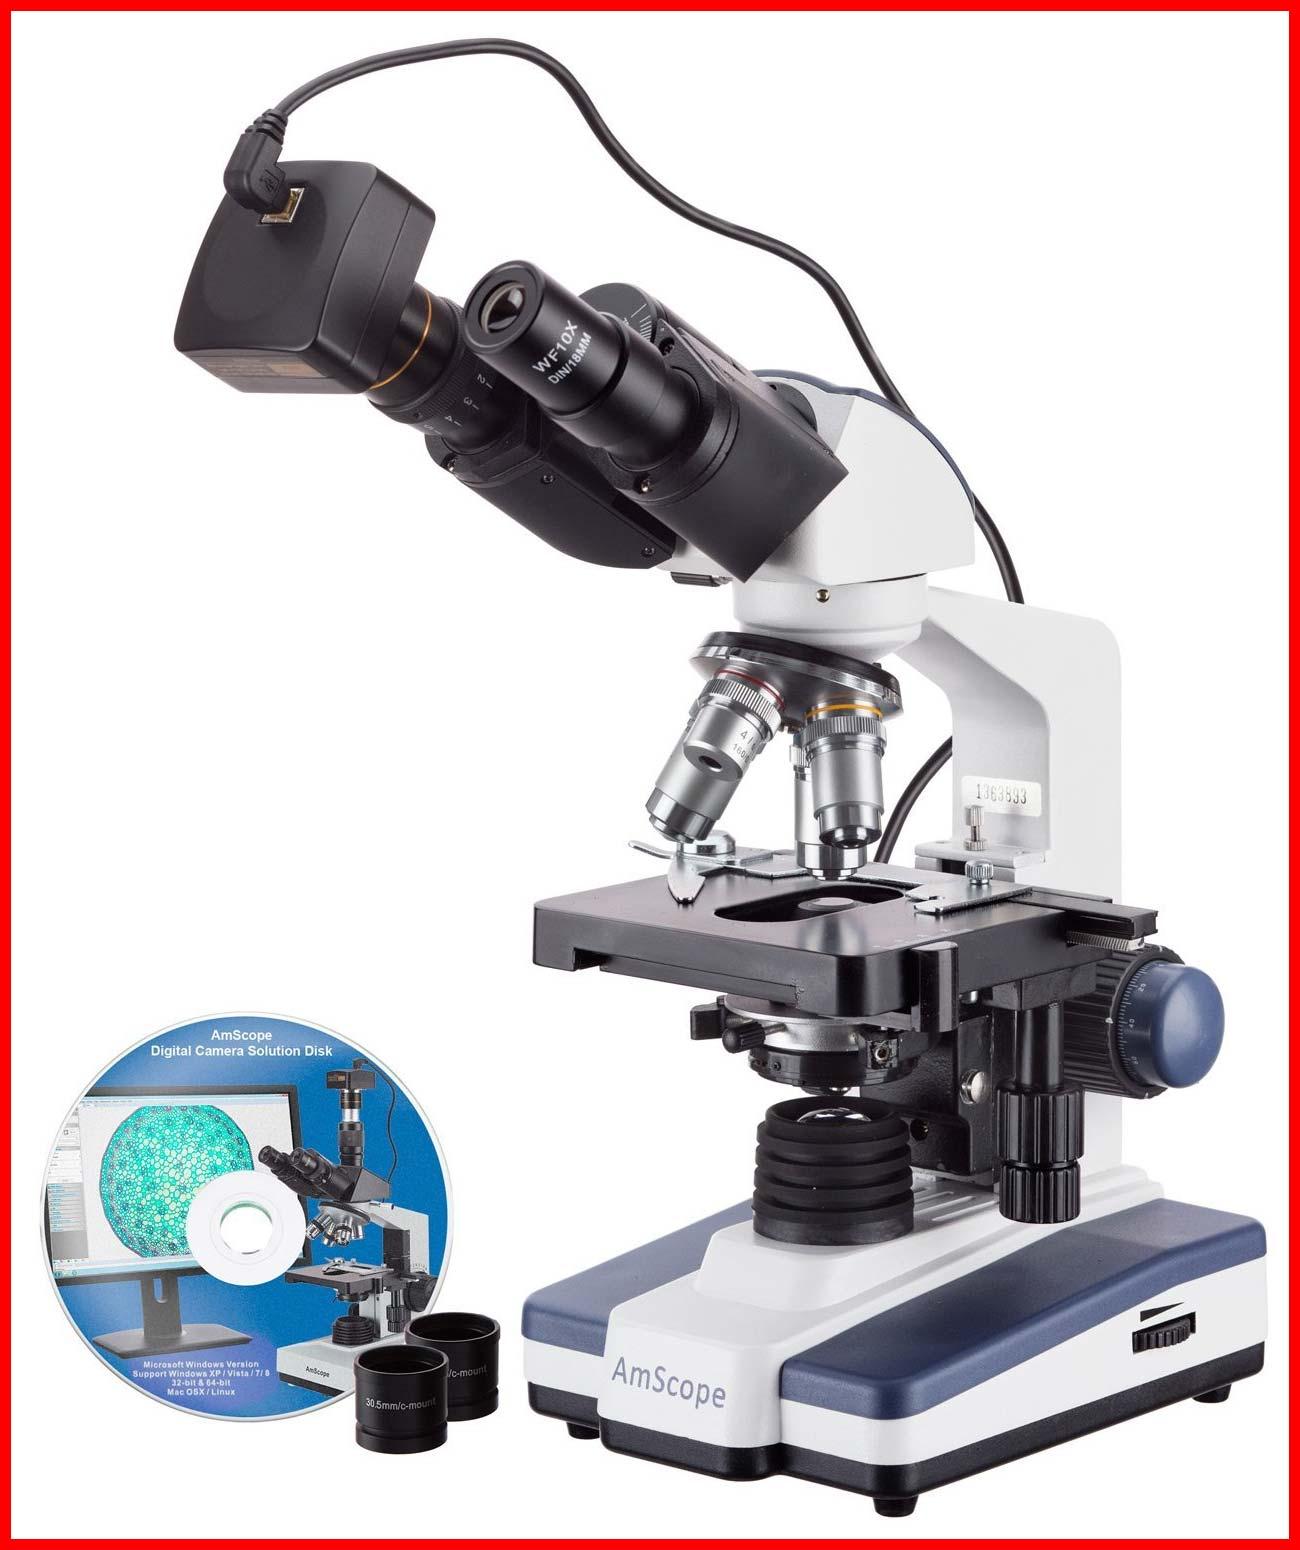 Binokularmikroskop Amscope digital mit 1,3MP USB-Kamera